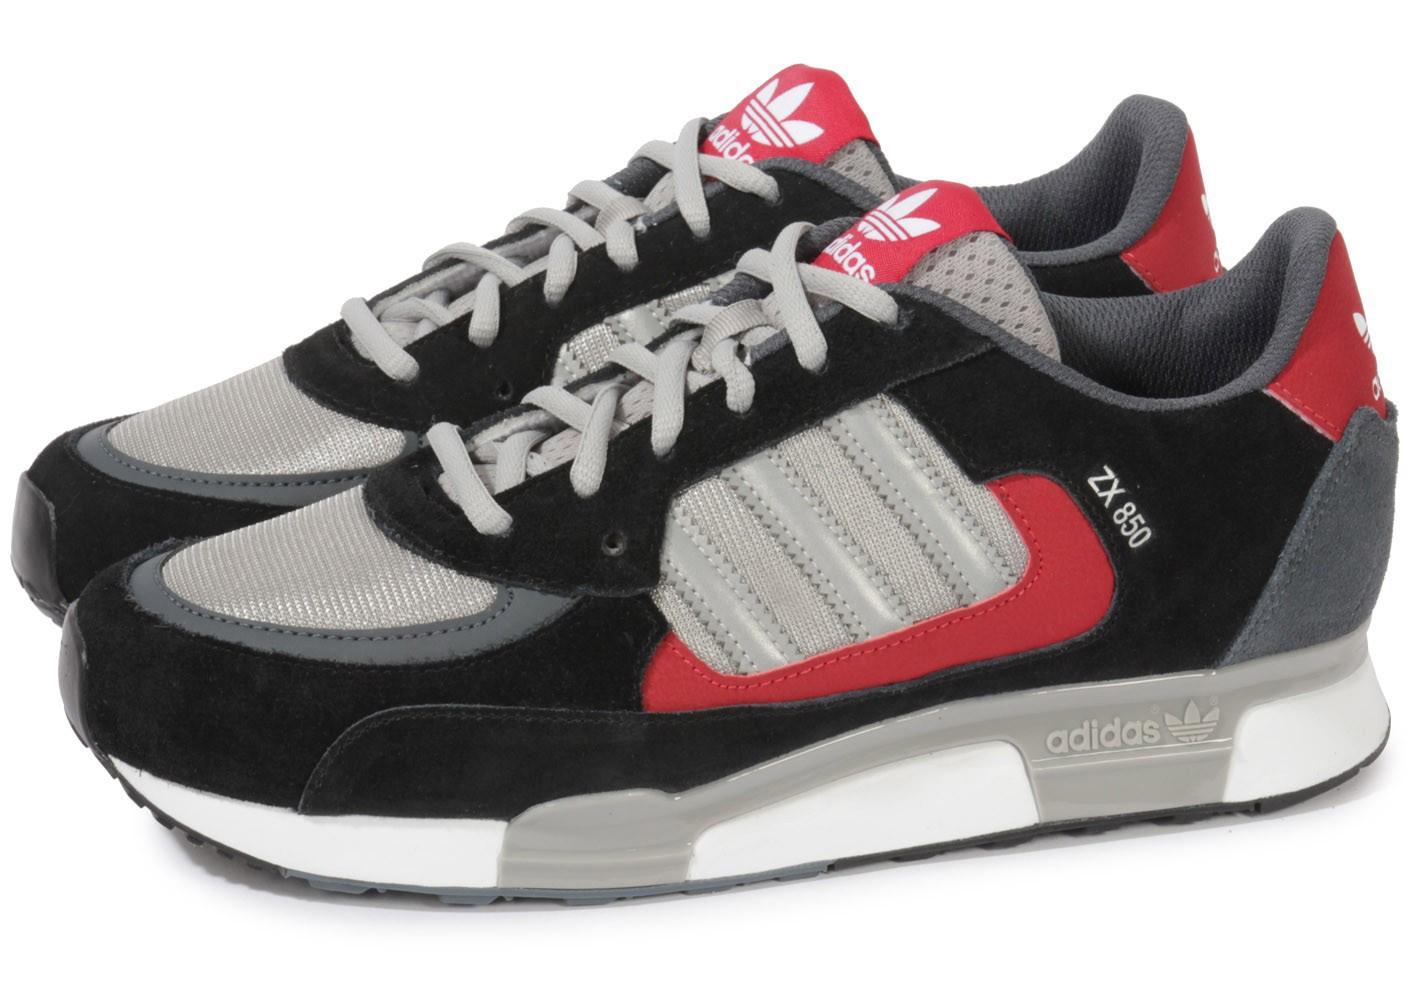 basket adidas zx 850 homme noir